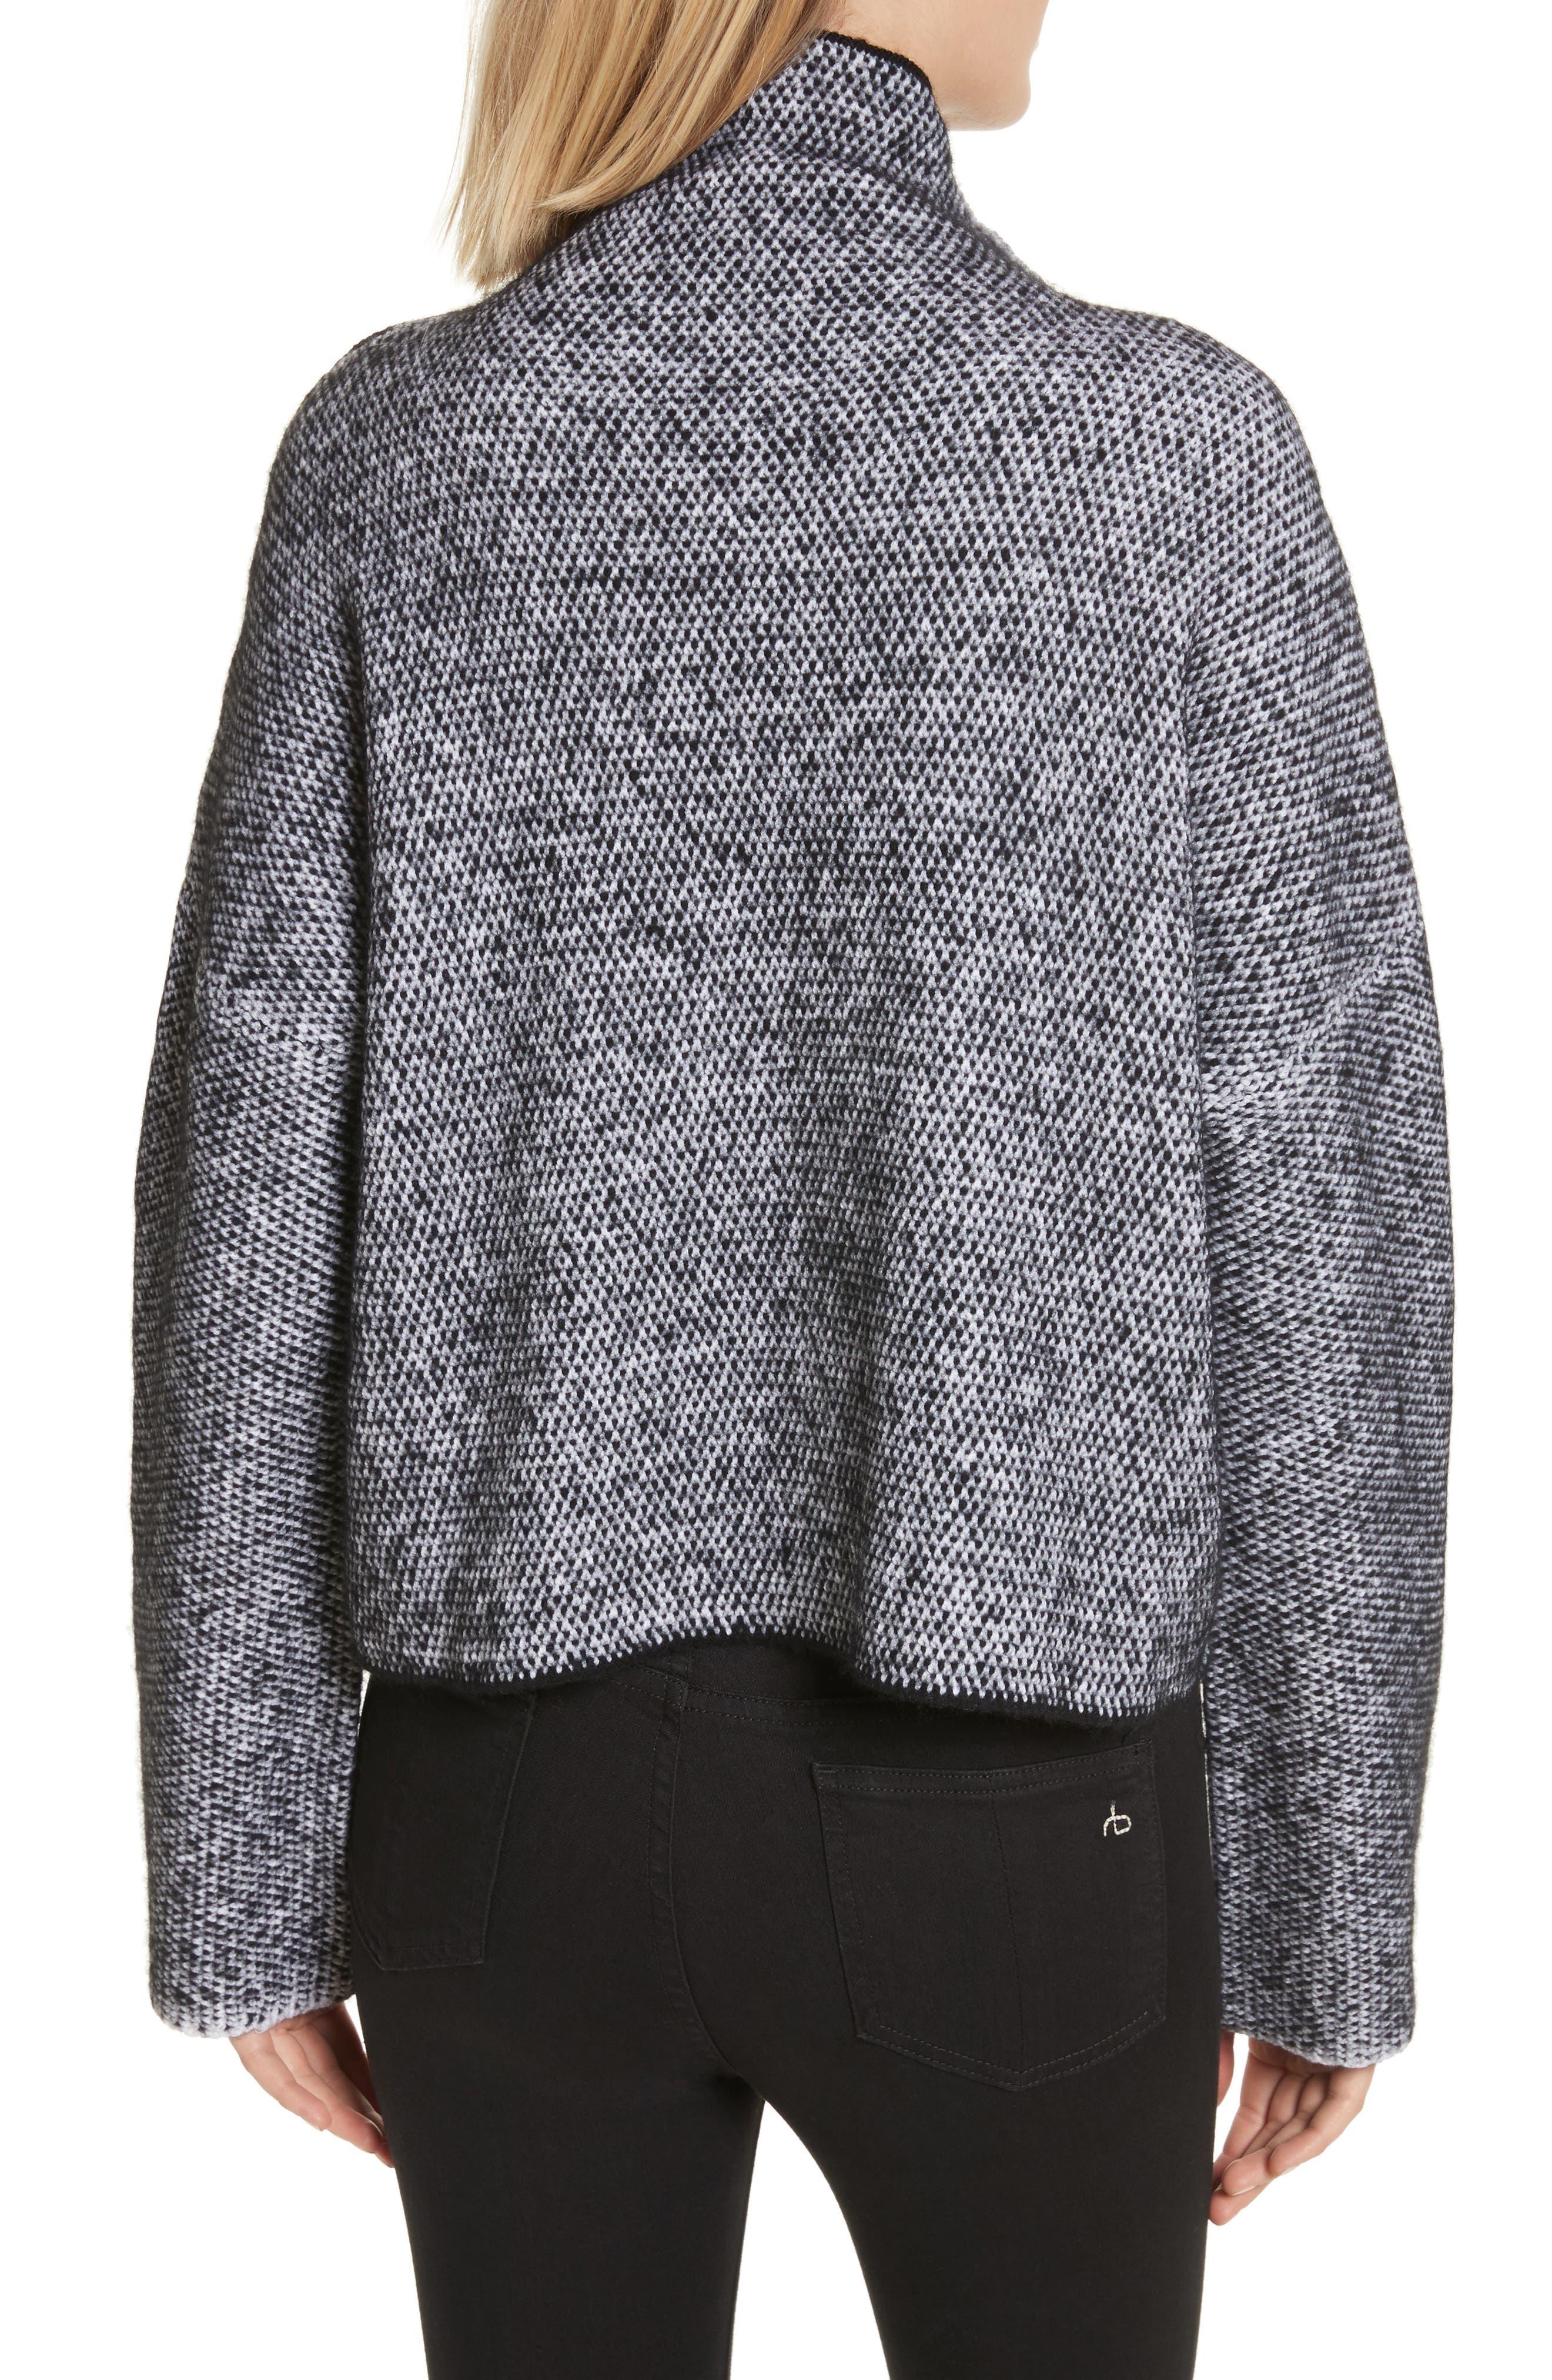 Robin Merino Wool Blend Sweater,                             Alternate thumbnail 2, color,